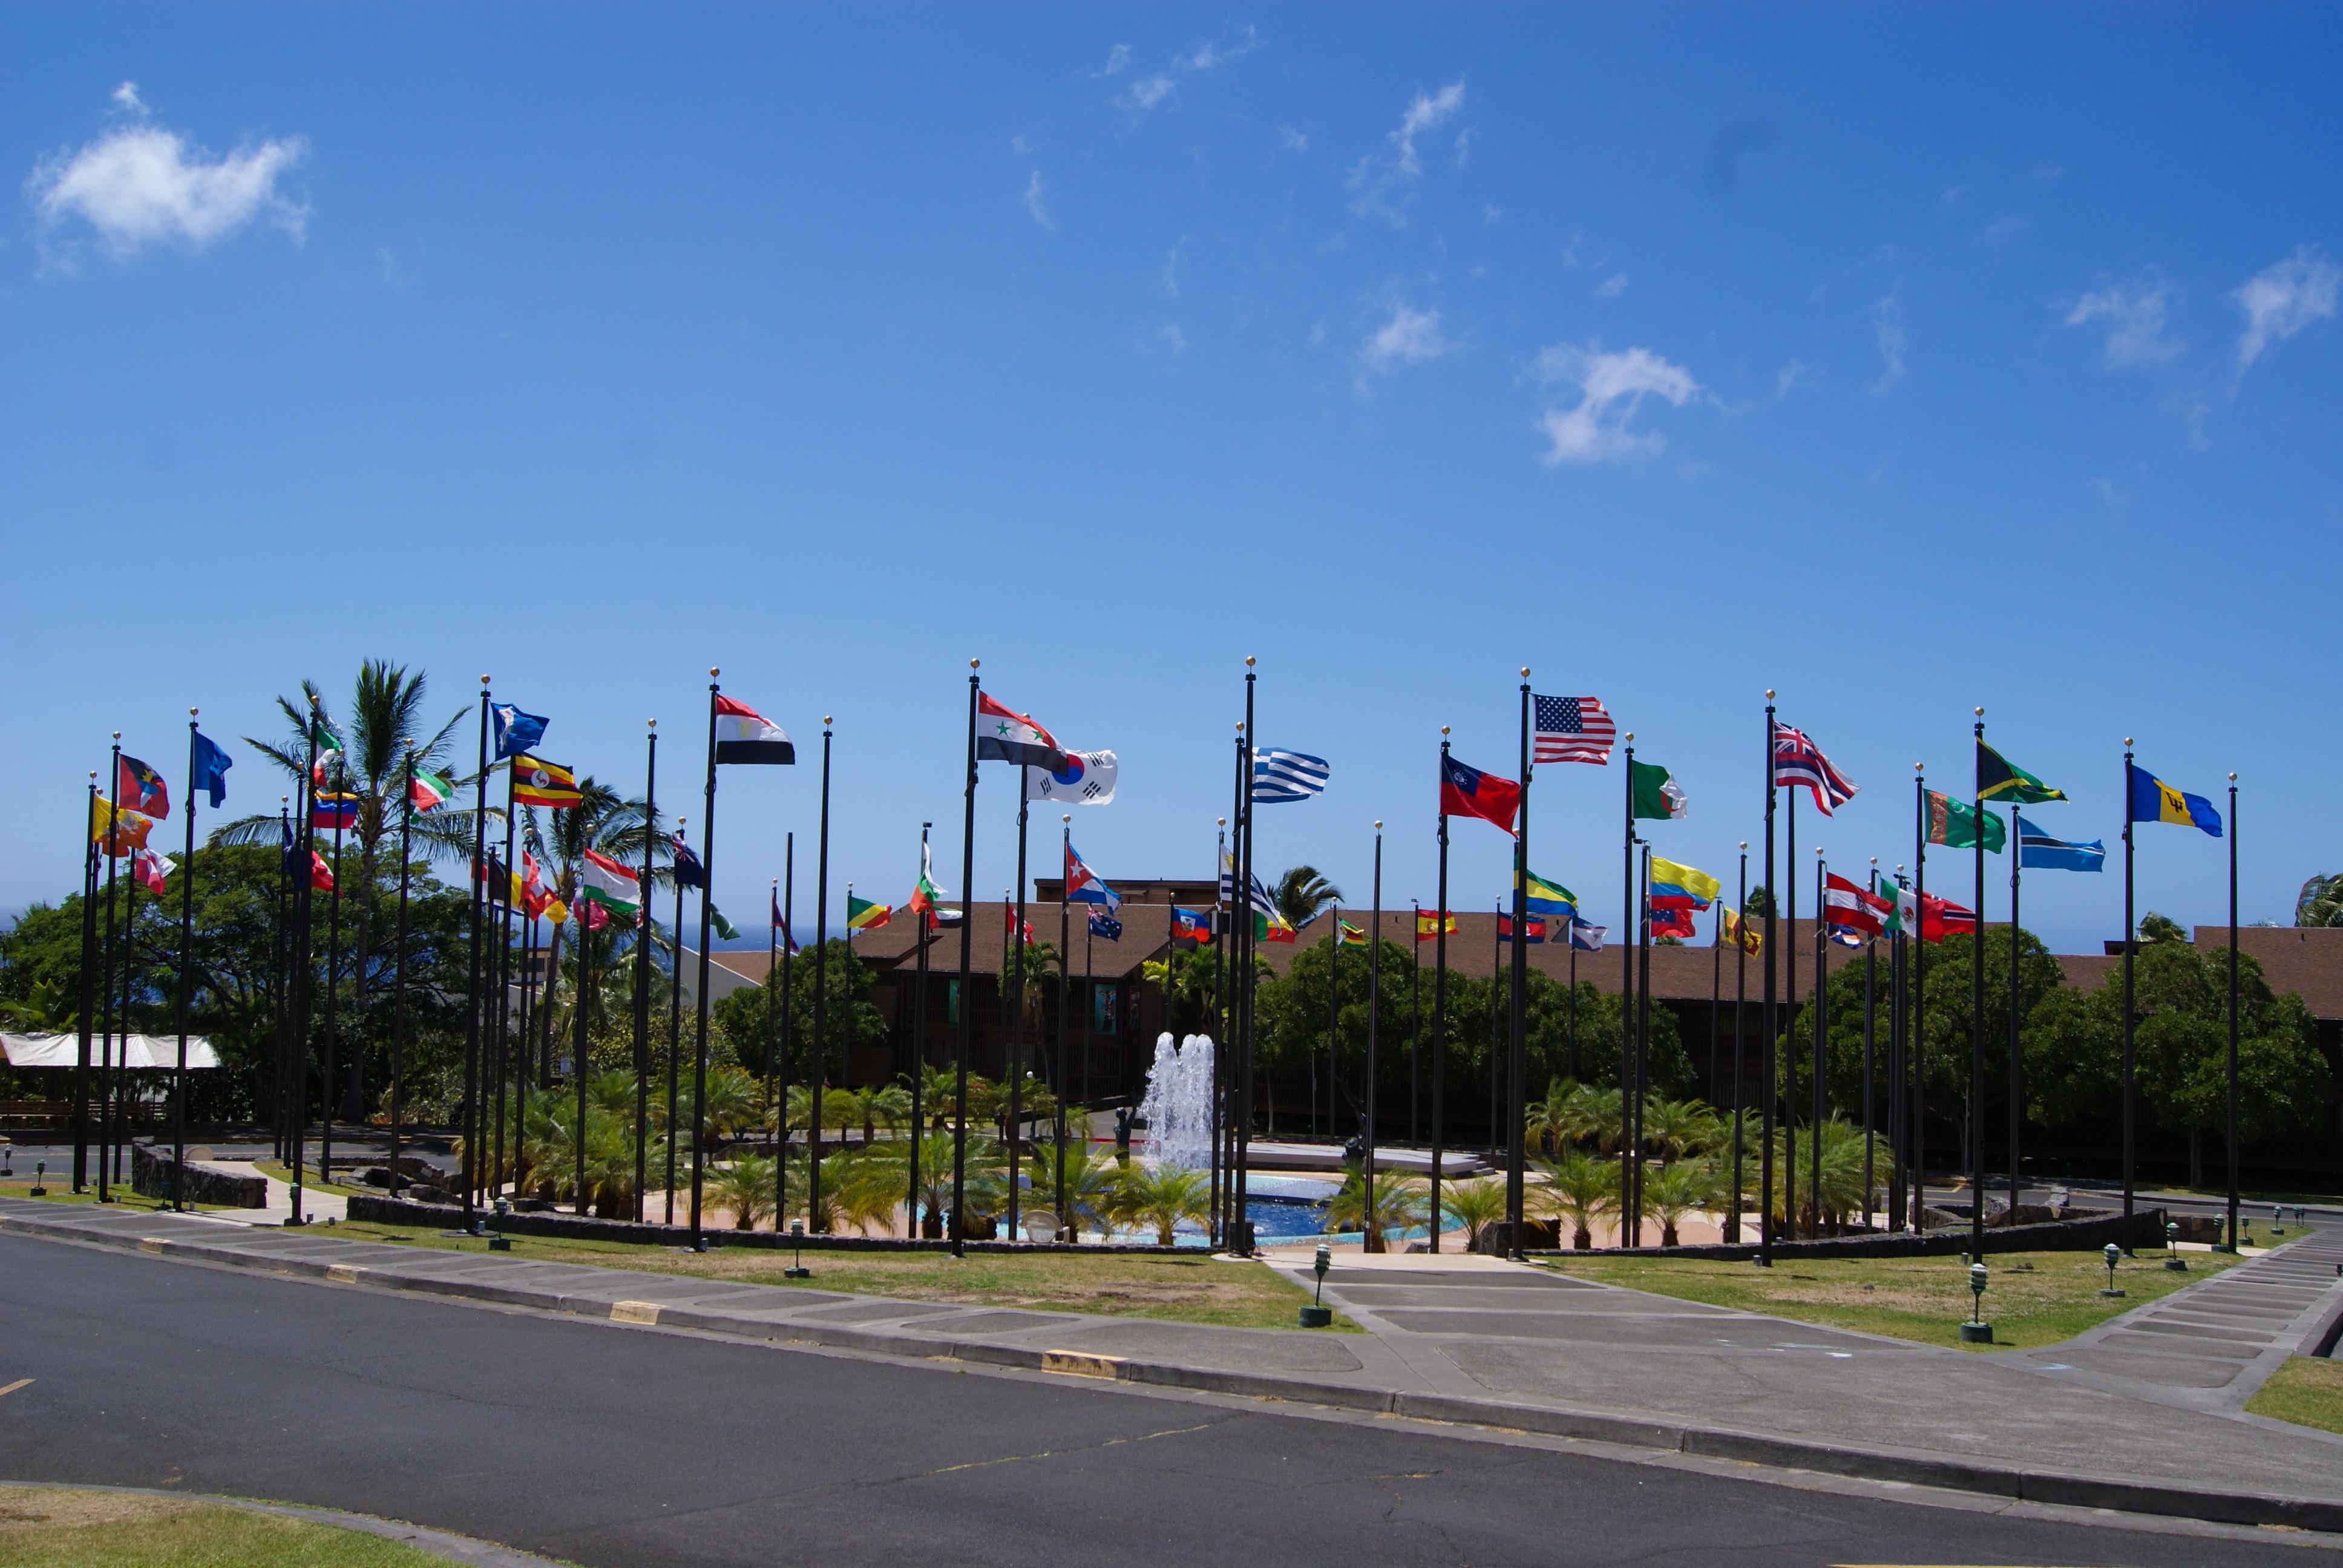 YWAM Kona - Flags